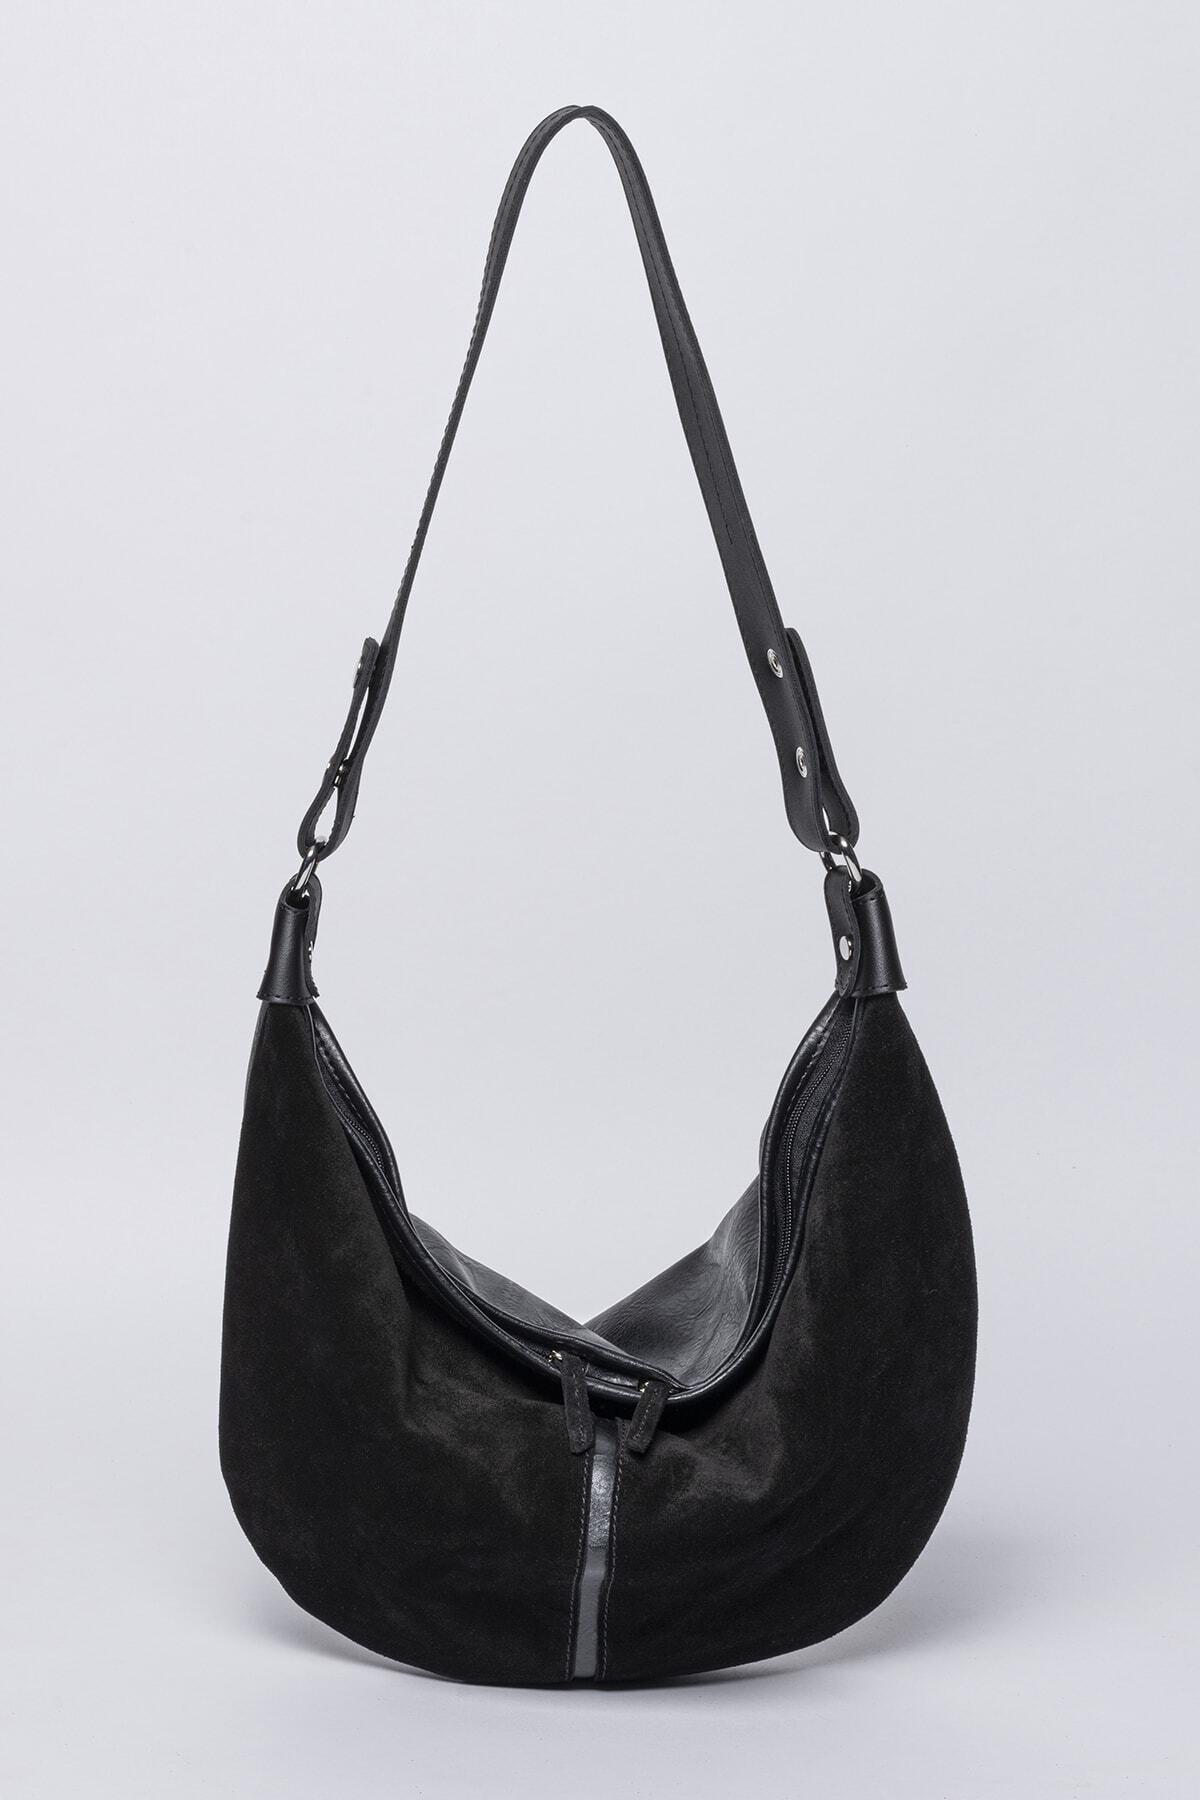 Jacquline Aeson Body Bag 1